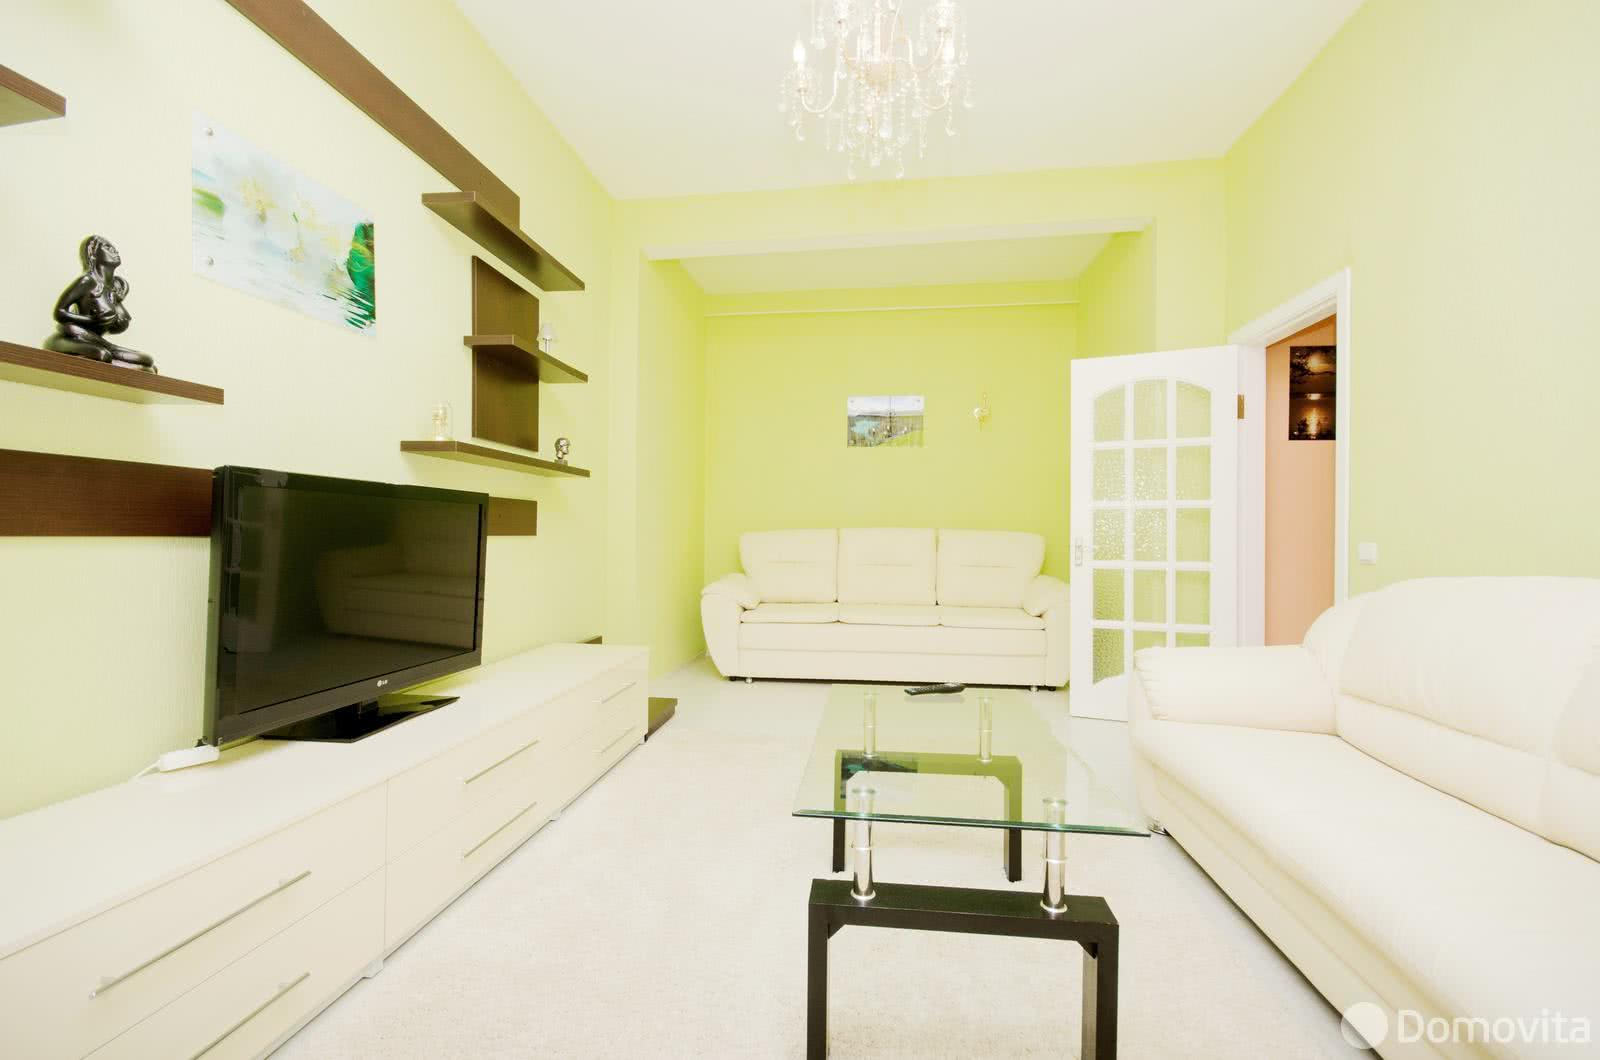 Аренда 2-комнатной квартиры на сутки в Минске пр-т Независимости, д. 40 - фото 1